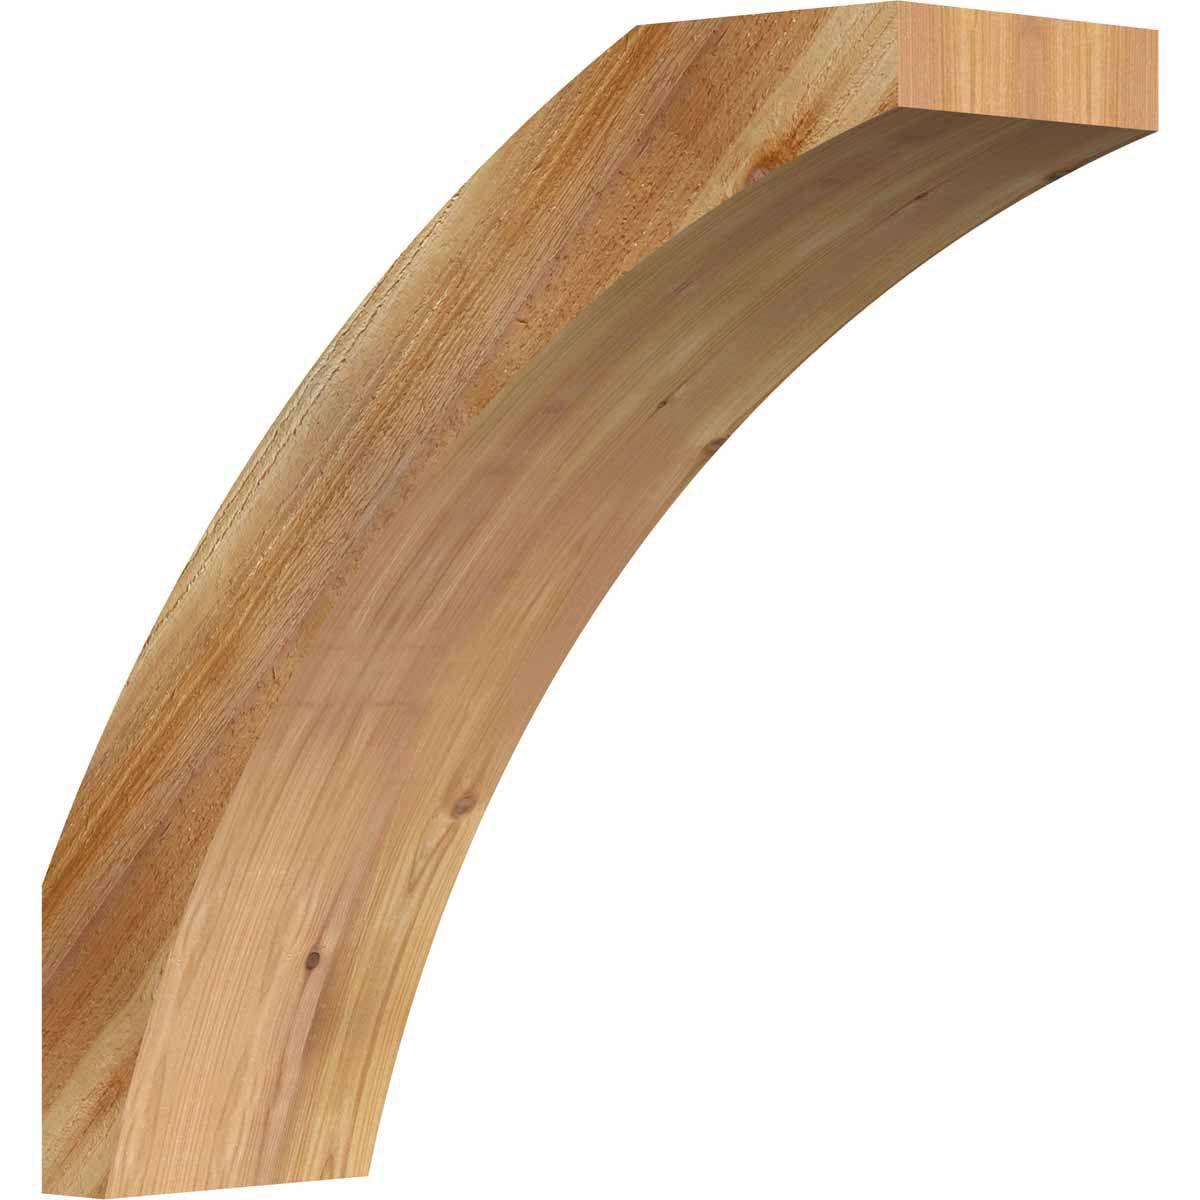 Perfect Thorton Rustic Timber Wood Brace